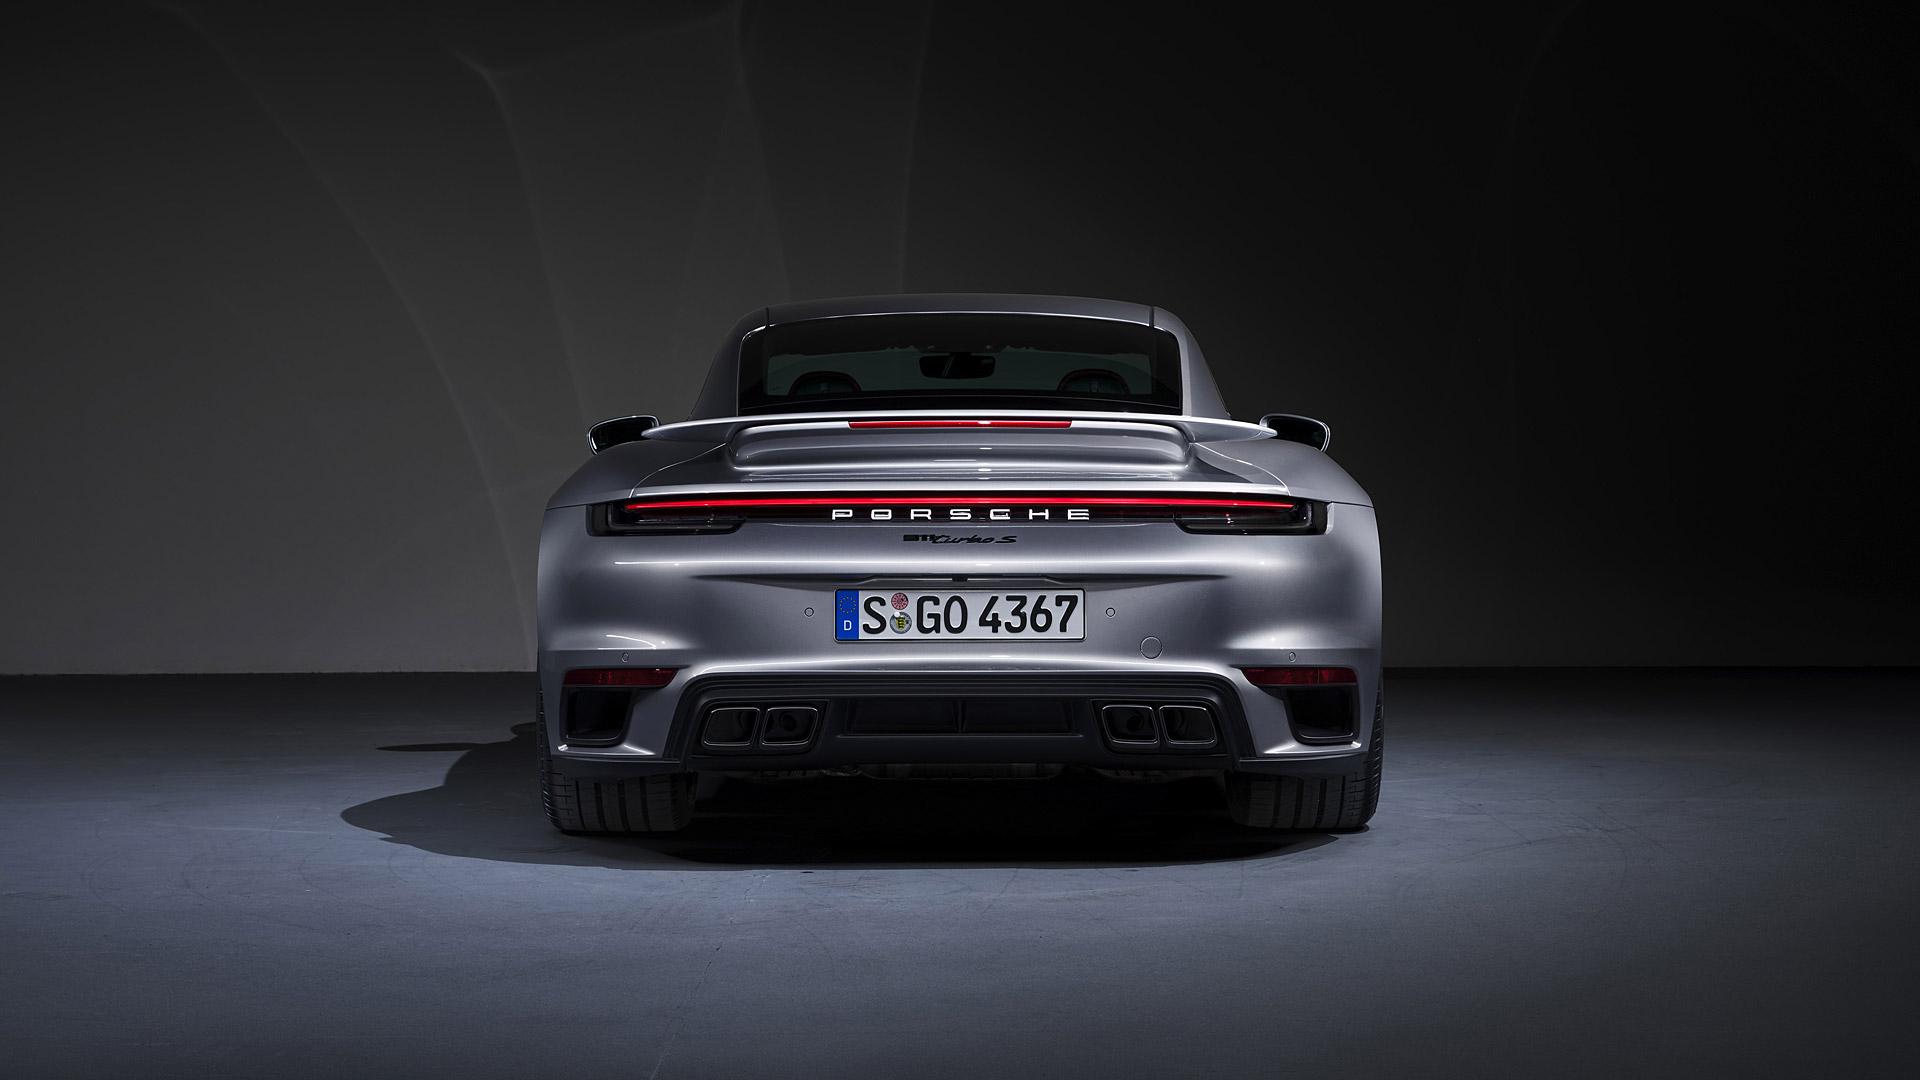 2020 Porsche 911 Turbo S Wallpapers Specs Videos   4K HD 1920x1080